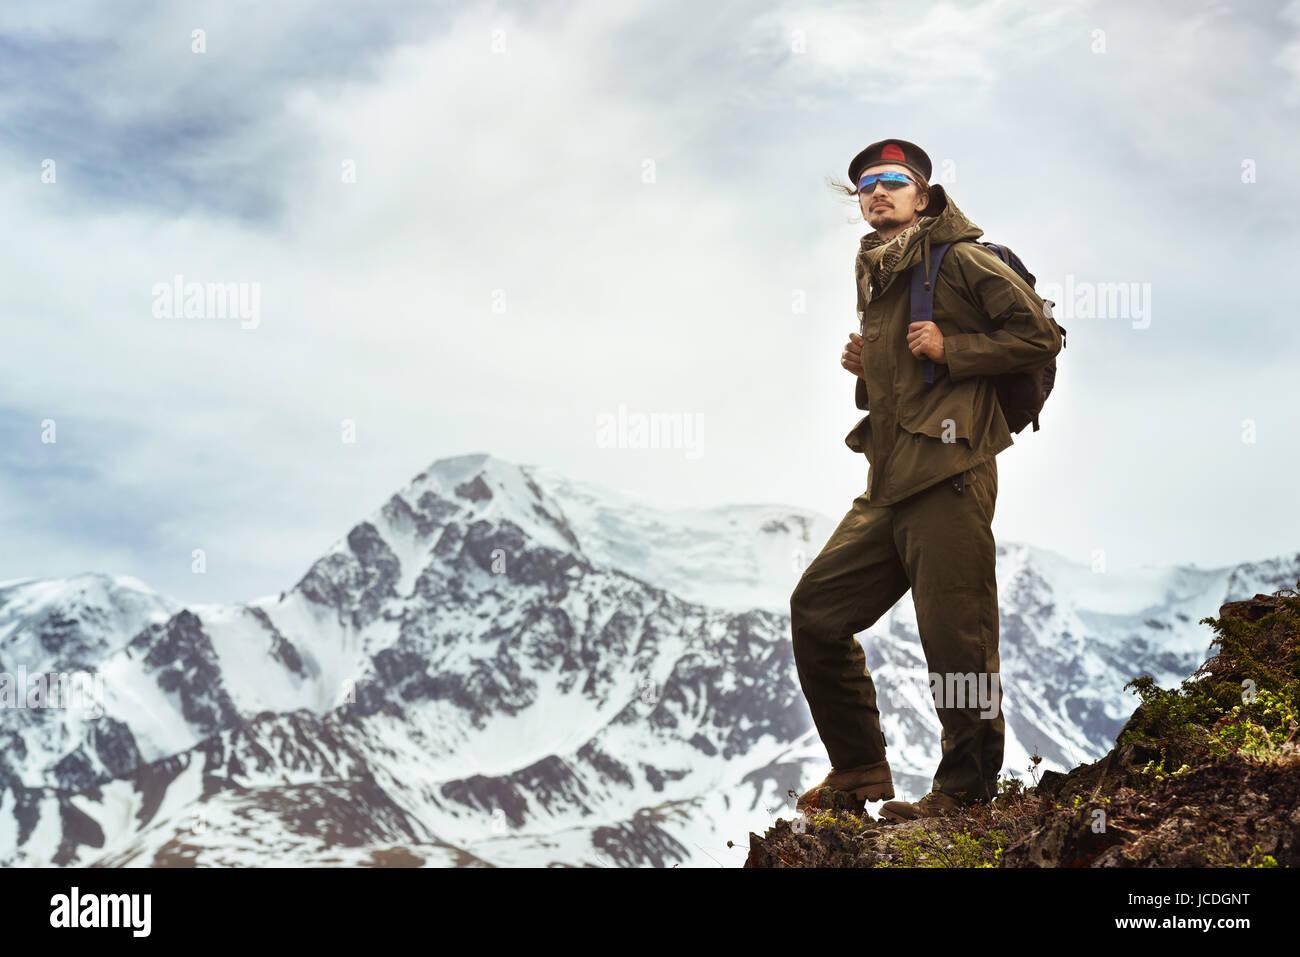 Reisende an der Spitze der Berge. Reisekonzept Stockbild